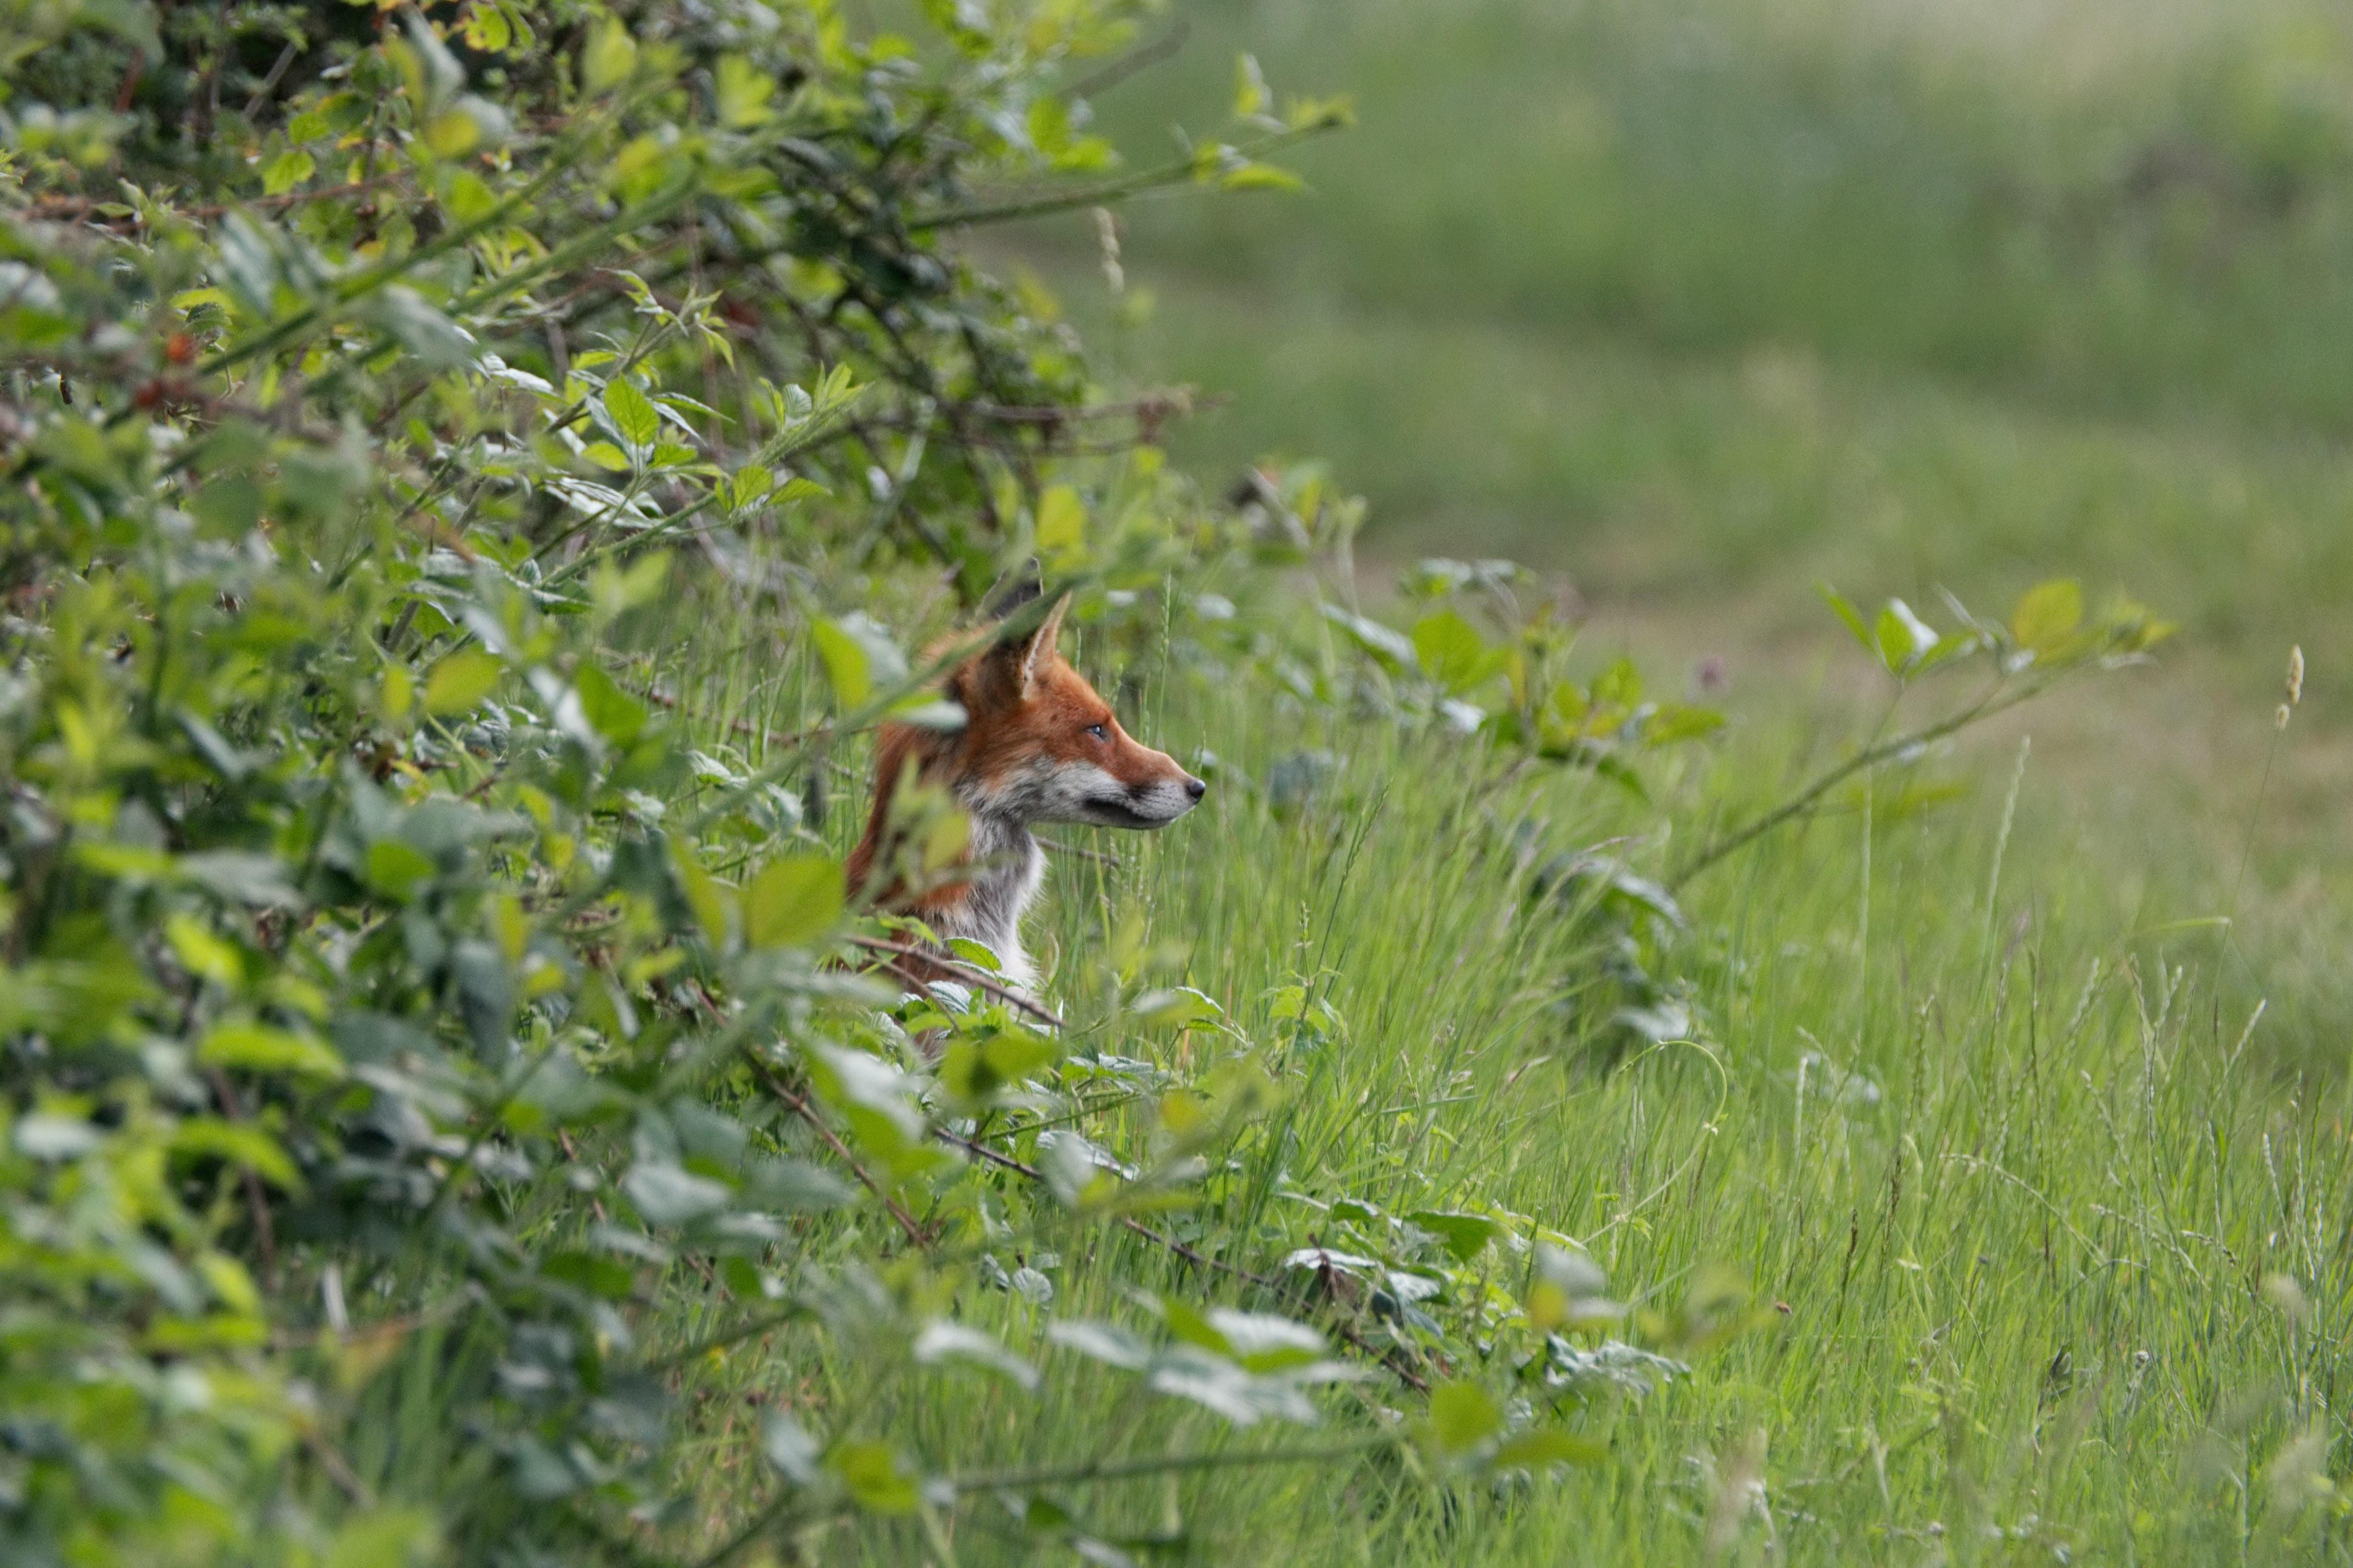 closeup photo of brown dog lying on green tall grass